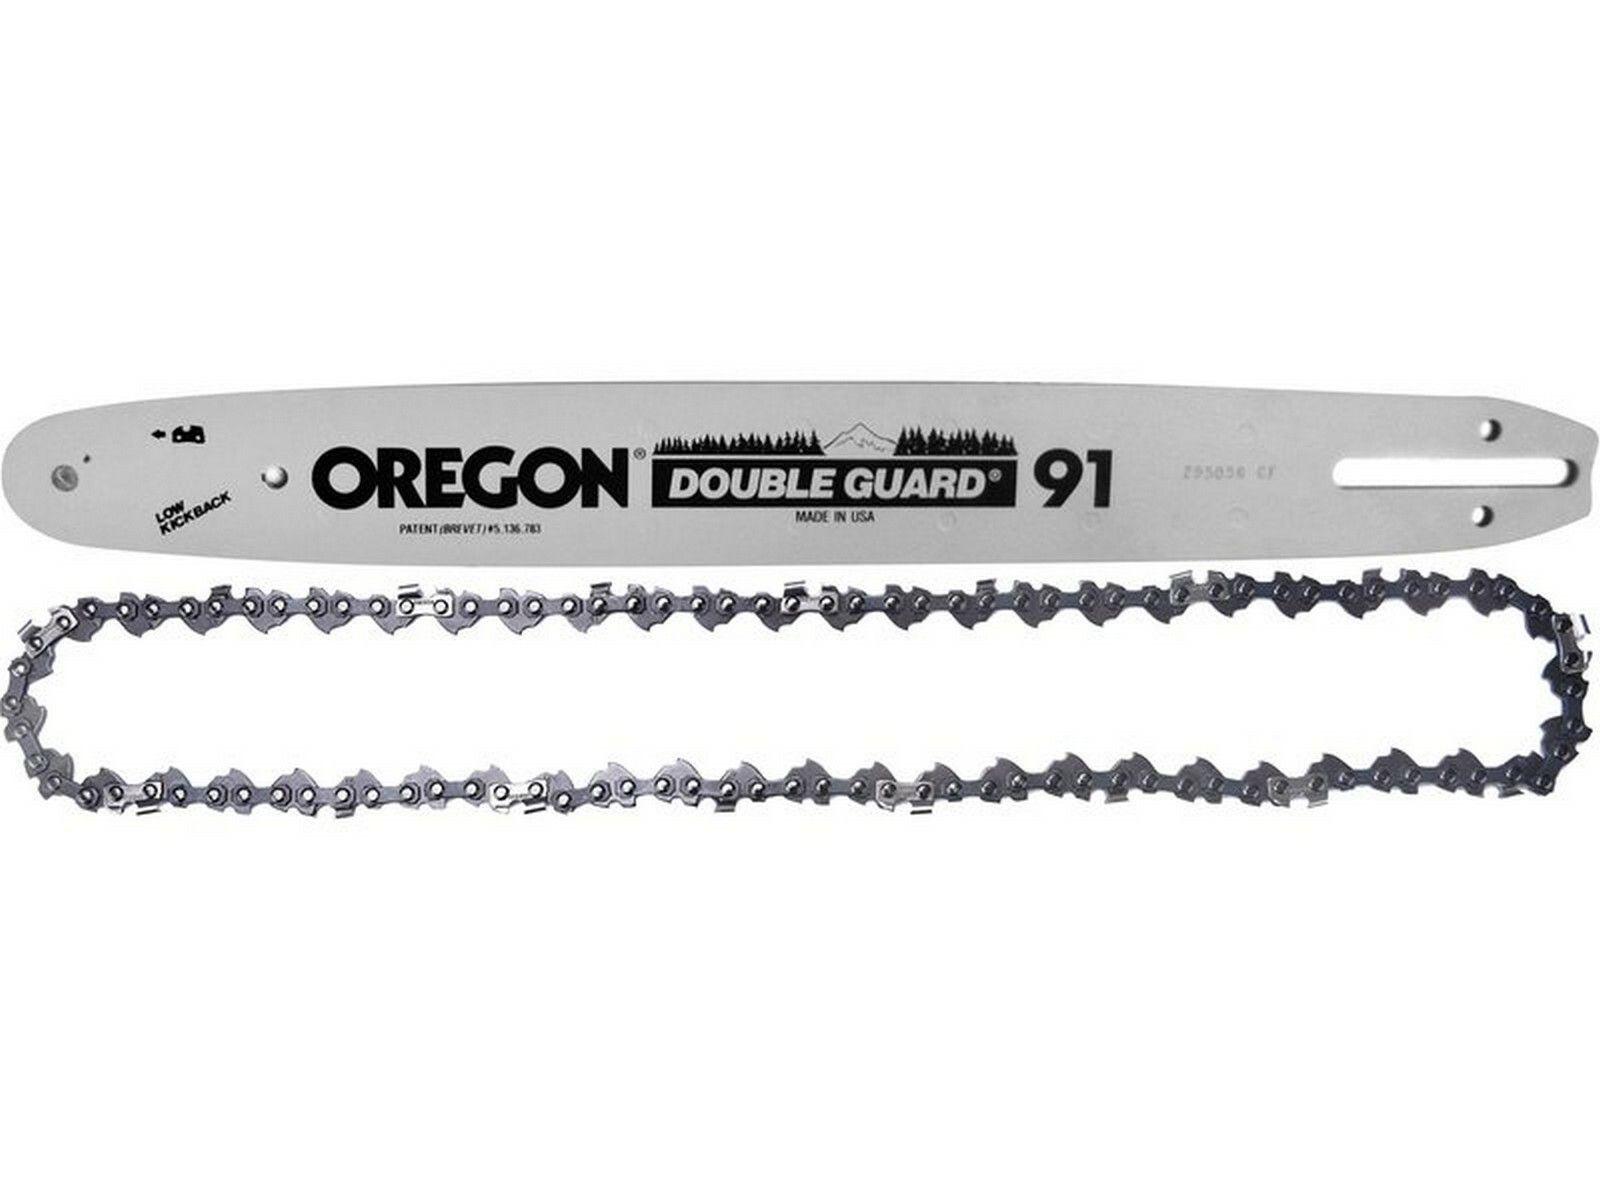 Řetěz a lišta náhradní, řetěz OREGON 91P045X, lišta 120SDEA041/515980 EXTOL INDUSTRIAL